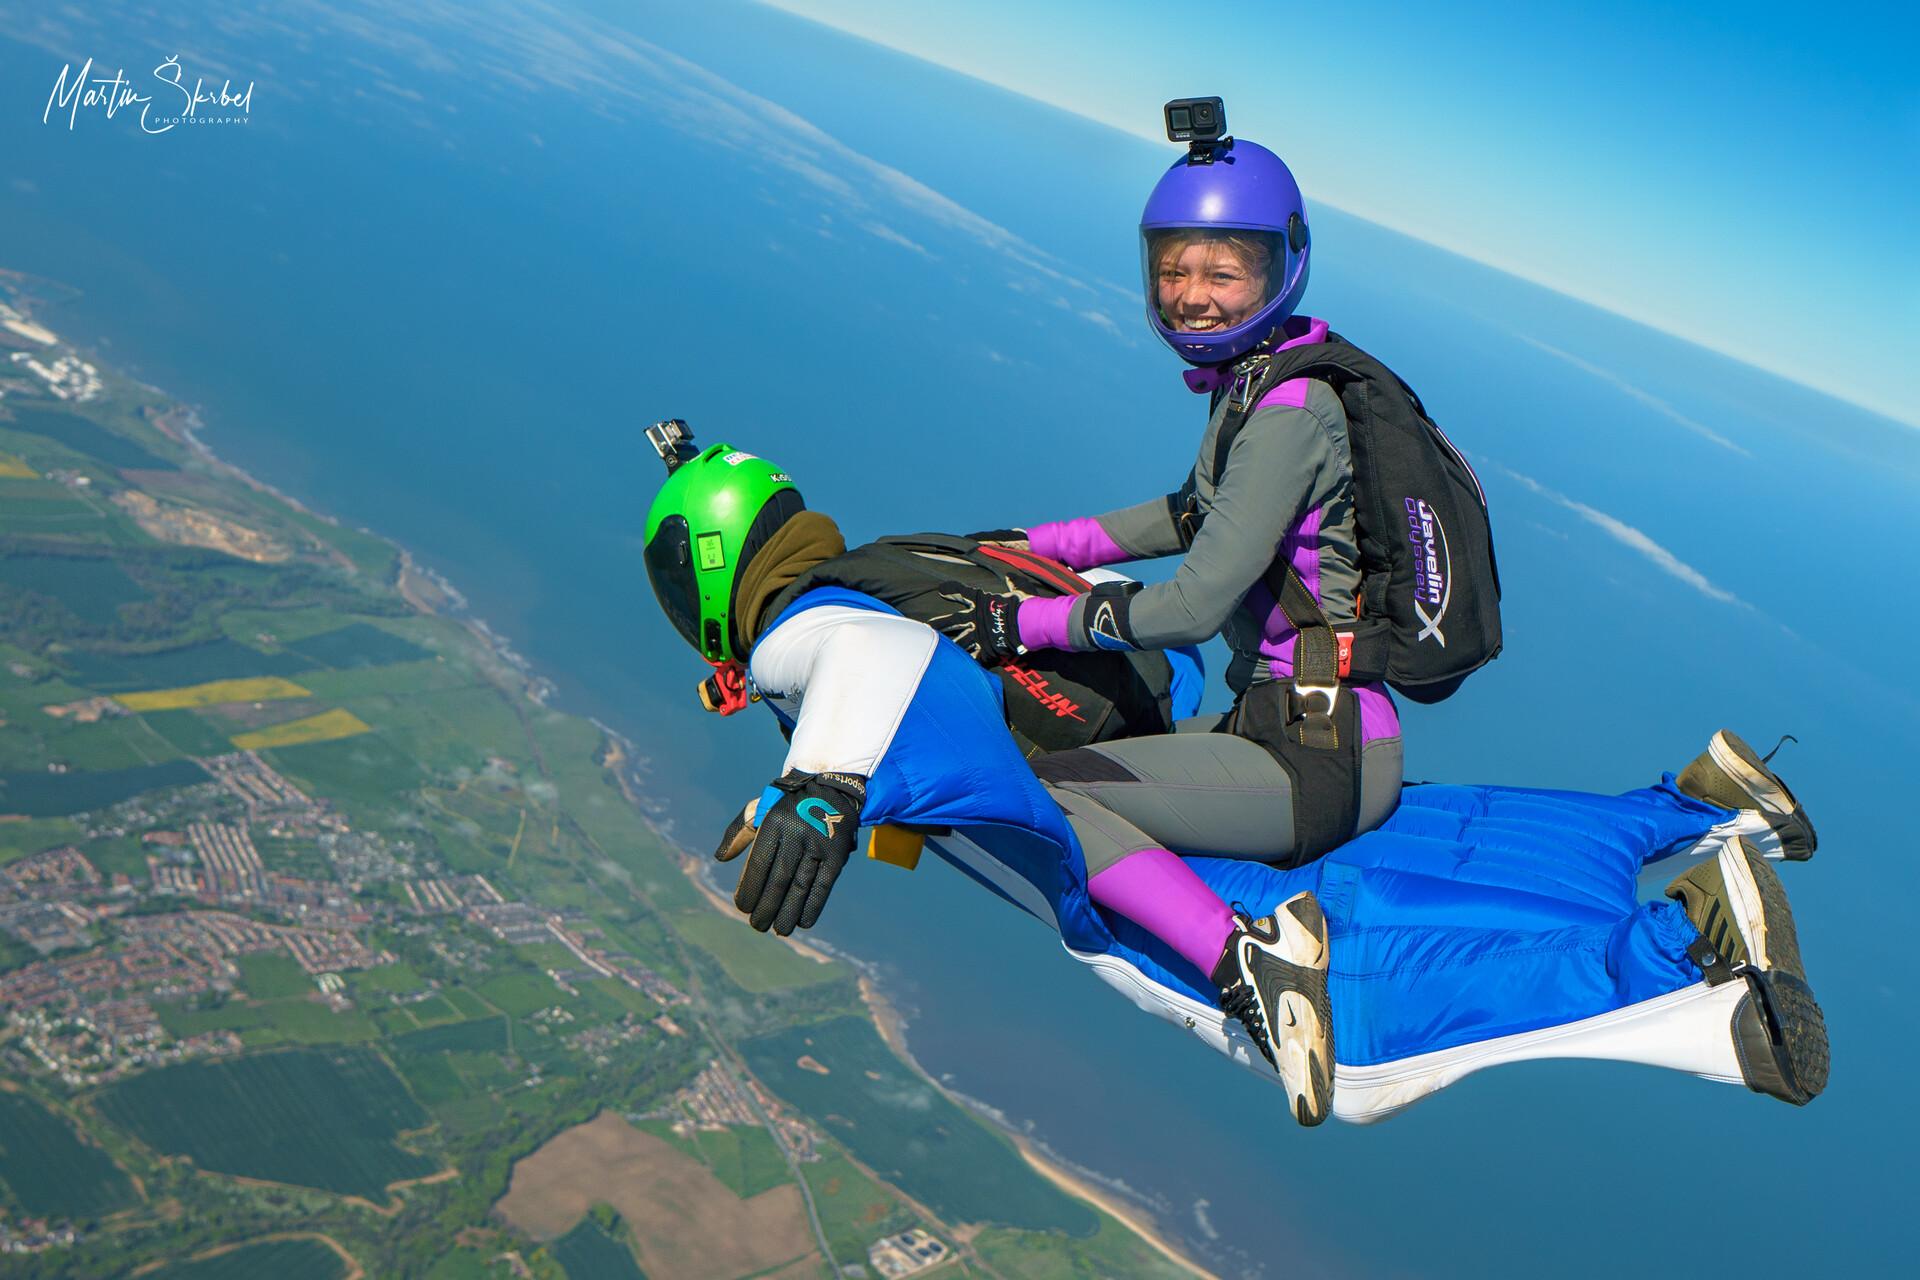 Morgan on a wingsuit rodeo :Martin Skrbel